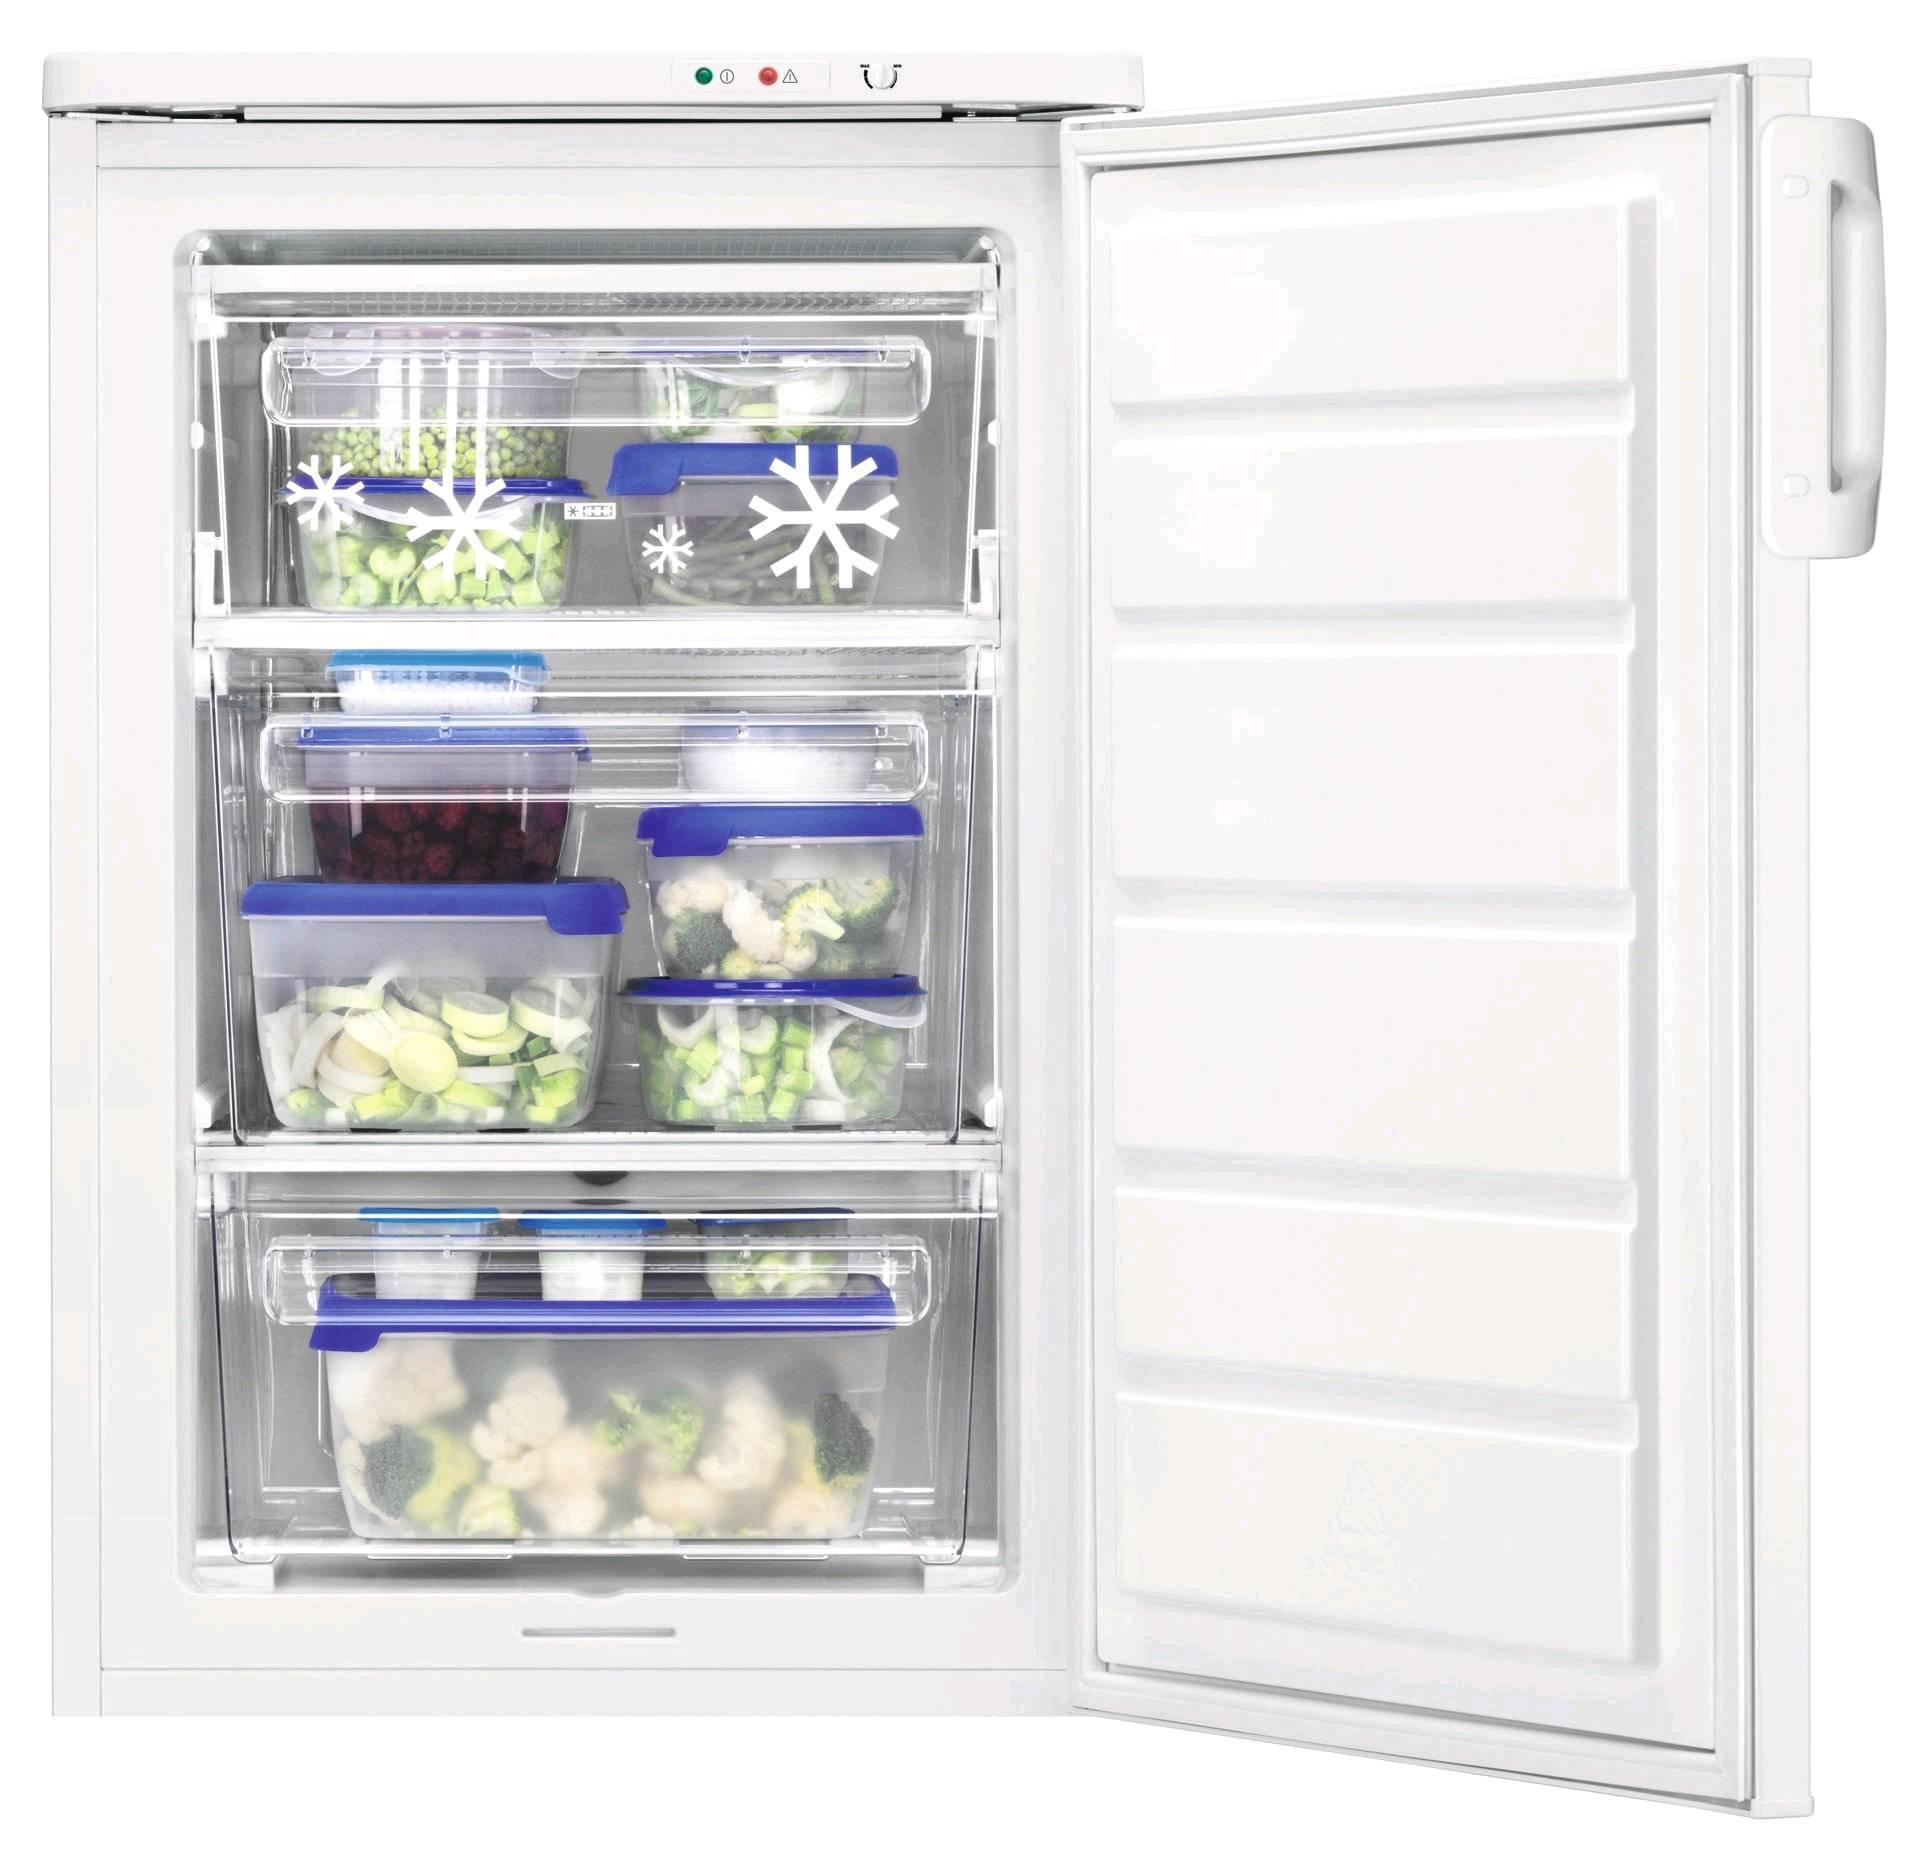 ZANUSSI 55cm wide Undercounter Freezer